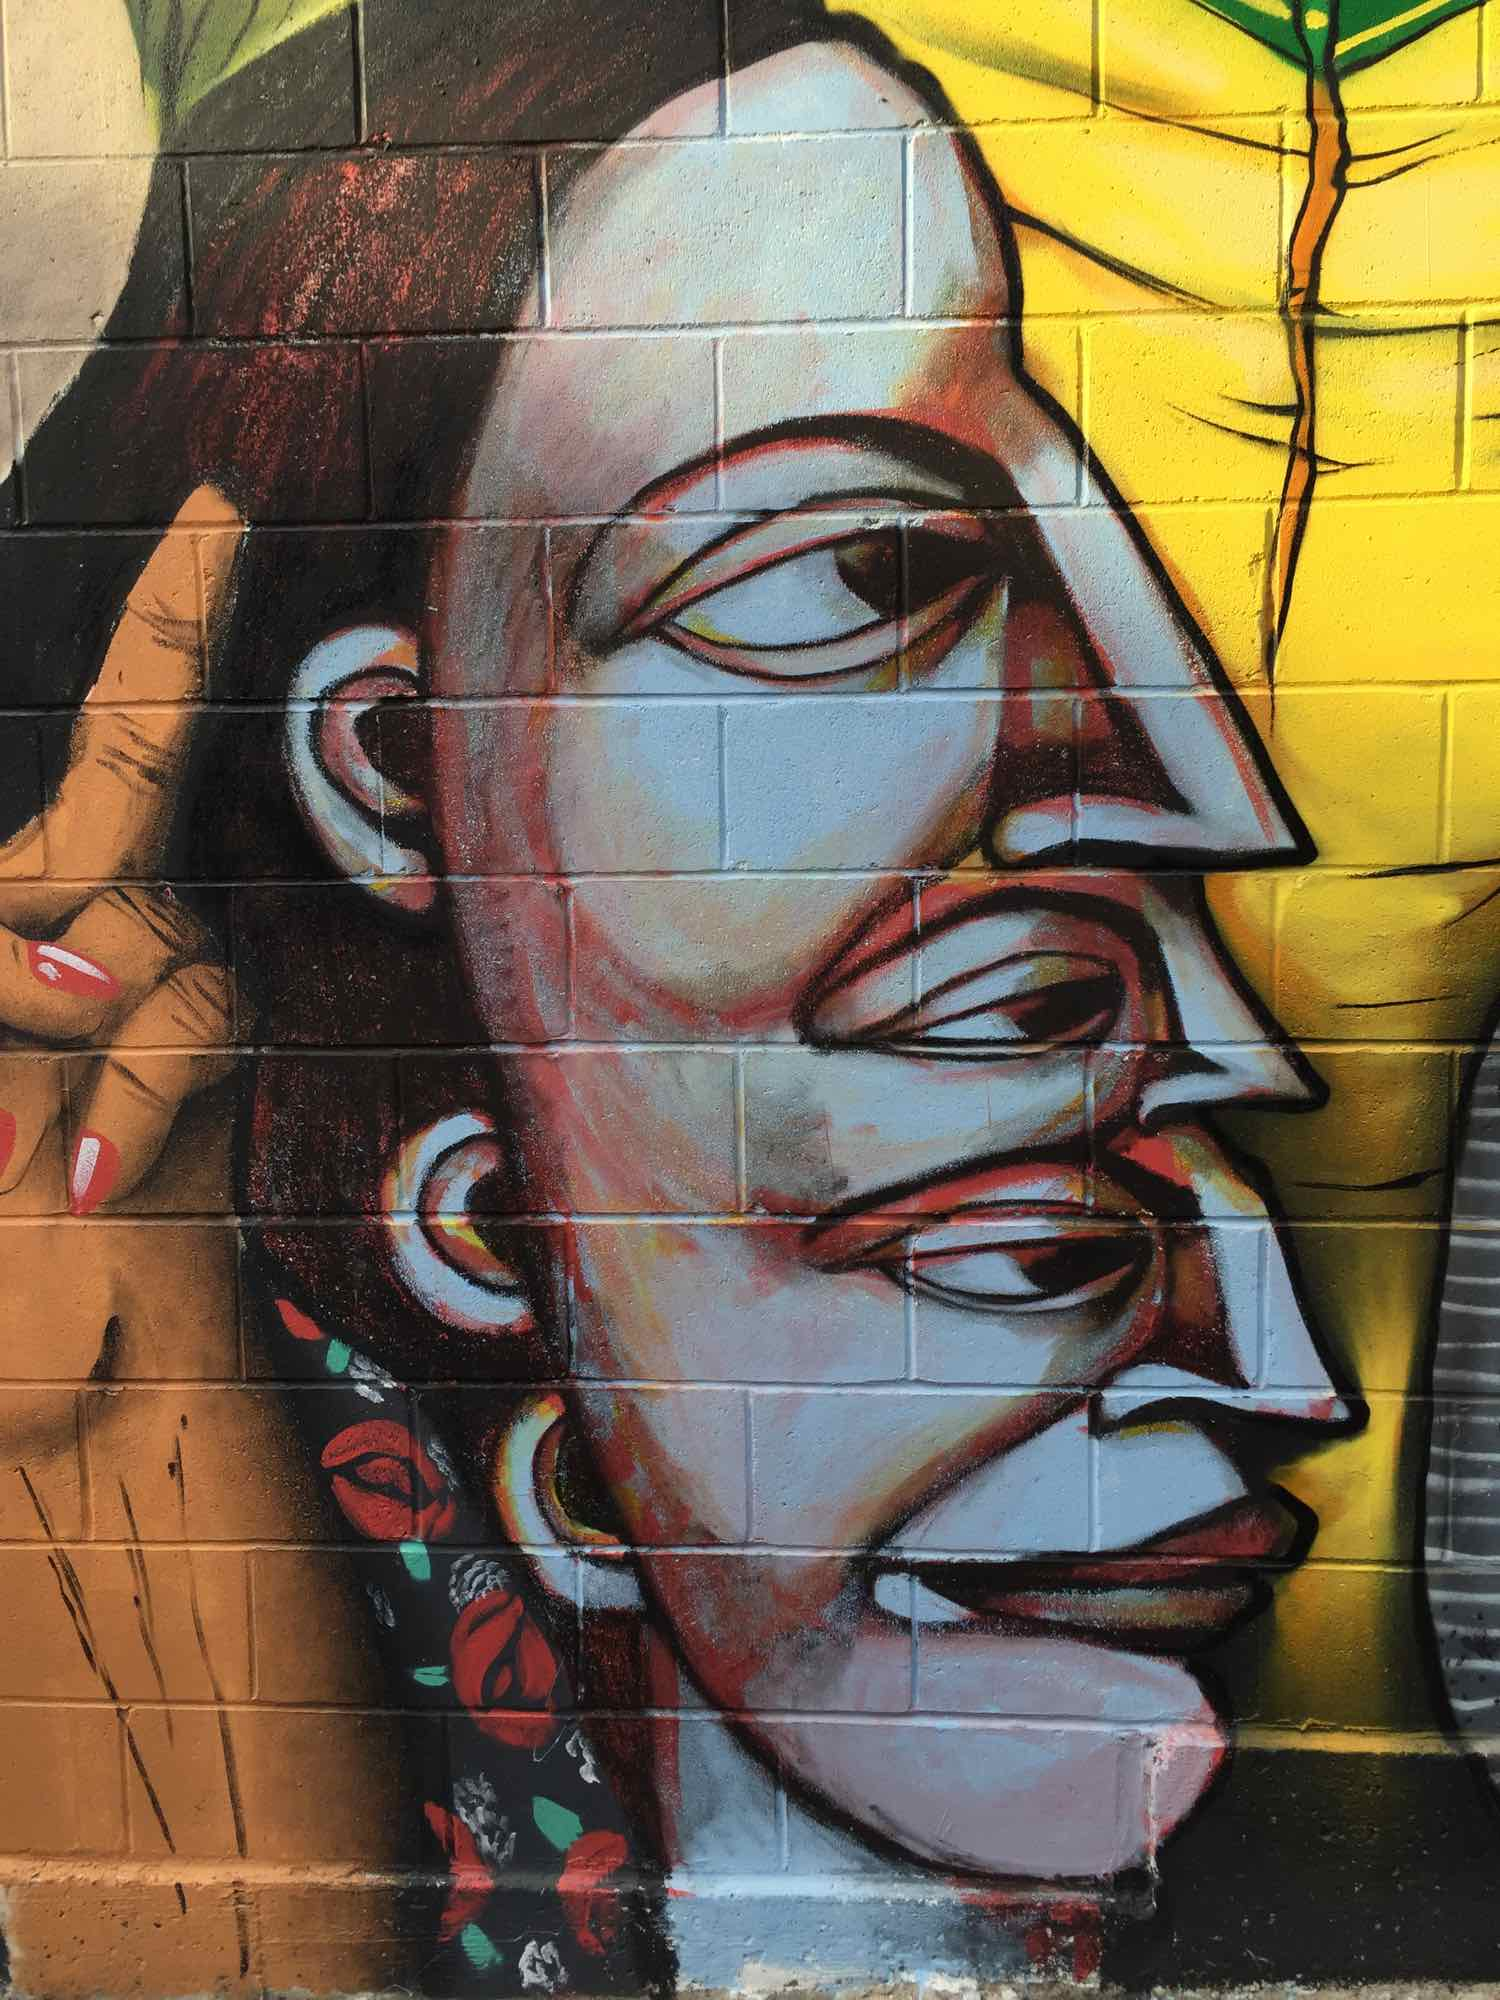 The_Walls_Of_Montreal-Ezra_Soiferman - 72.jpg